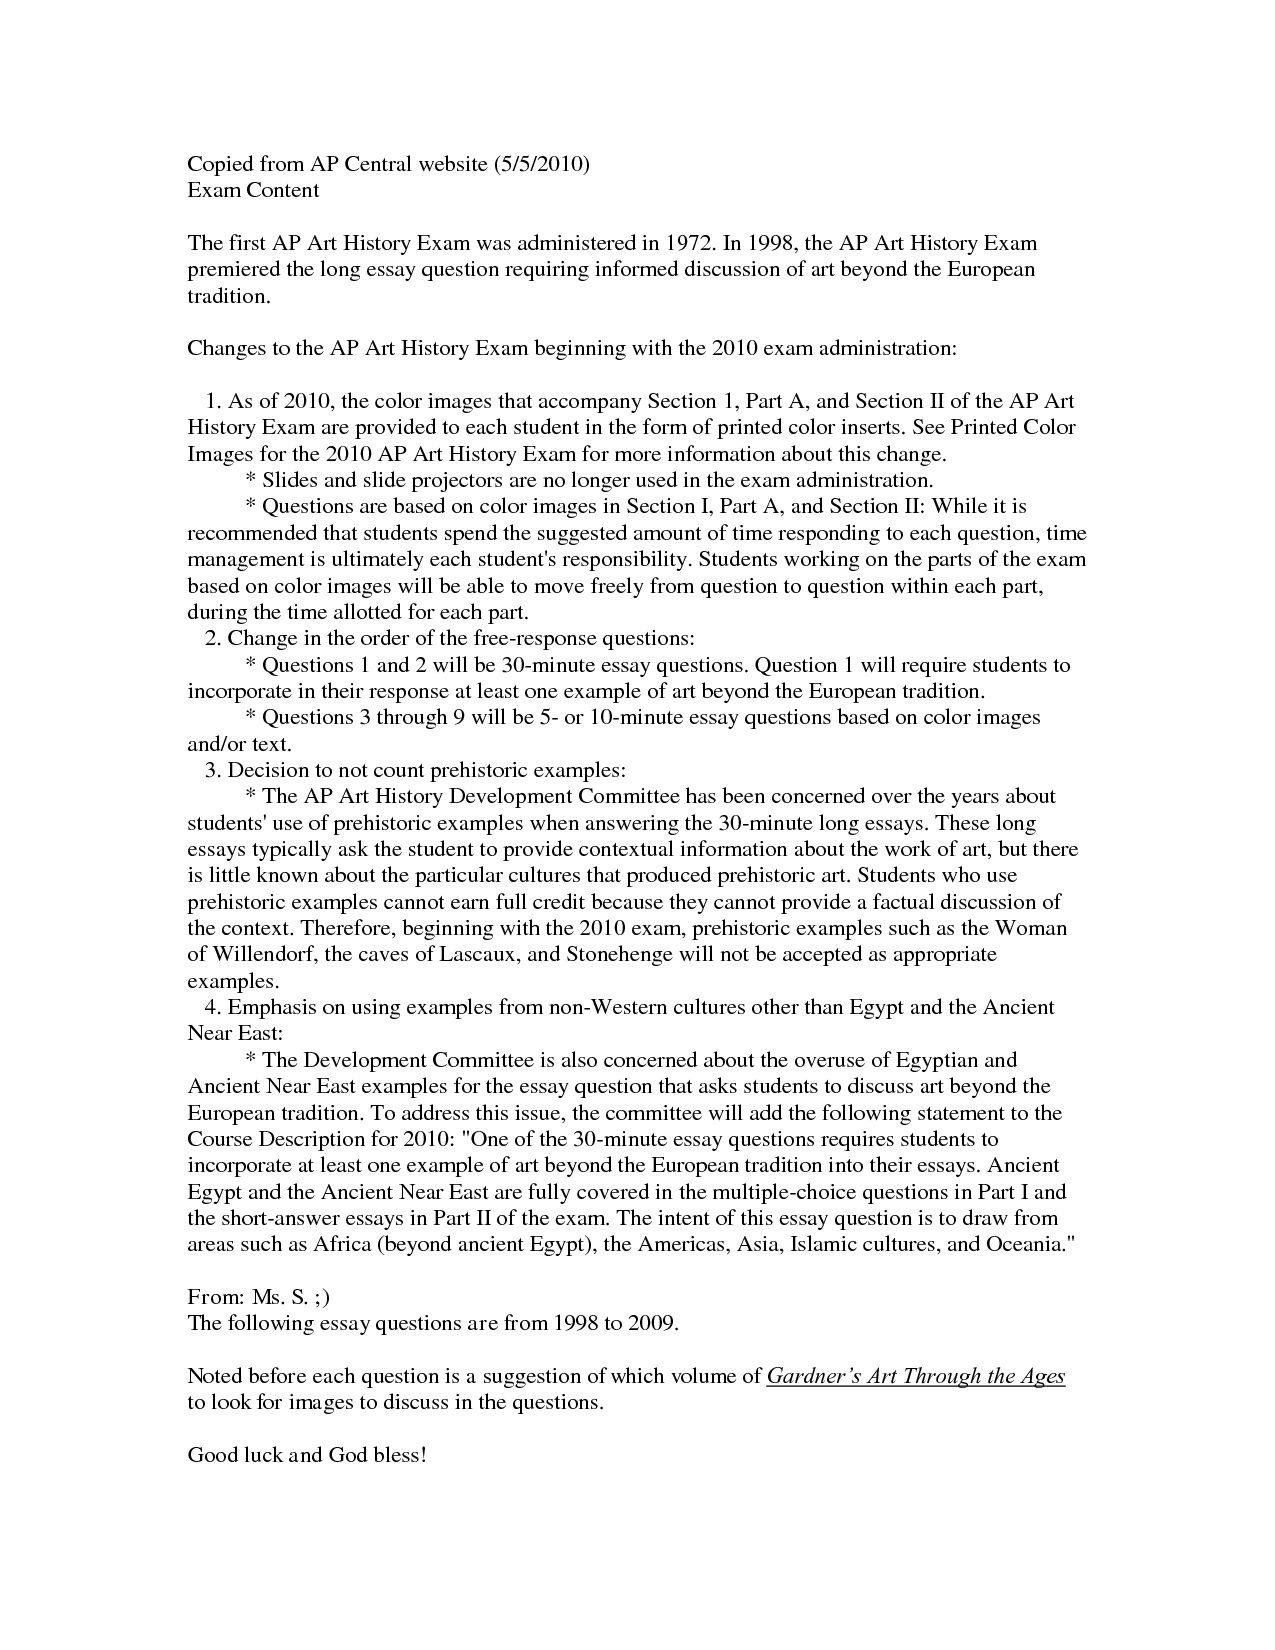 005 Wonderful Essay Paper Picture  Upsc 2019 In Hindi Pdf Format Cs Past 2018Full